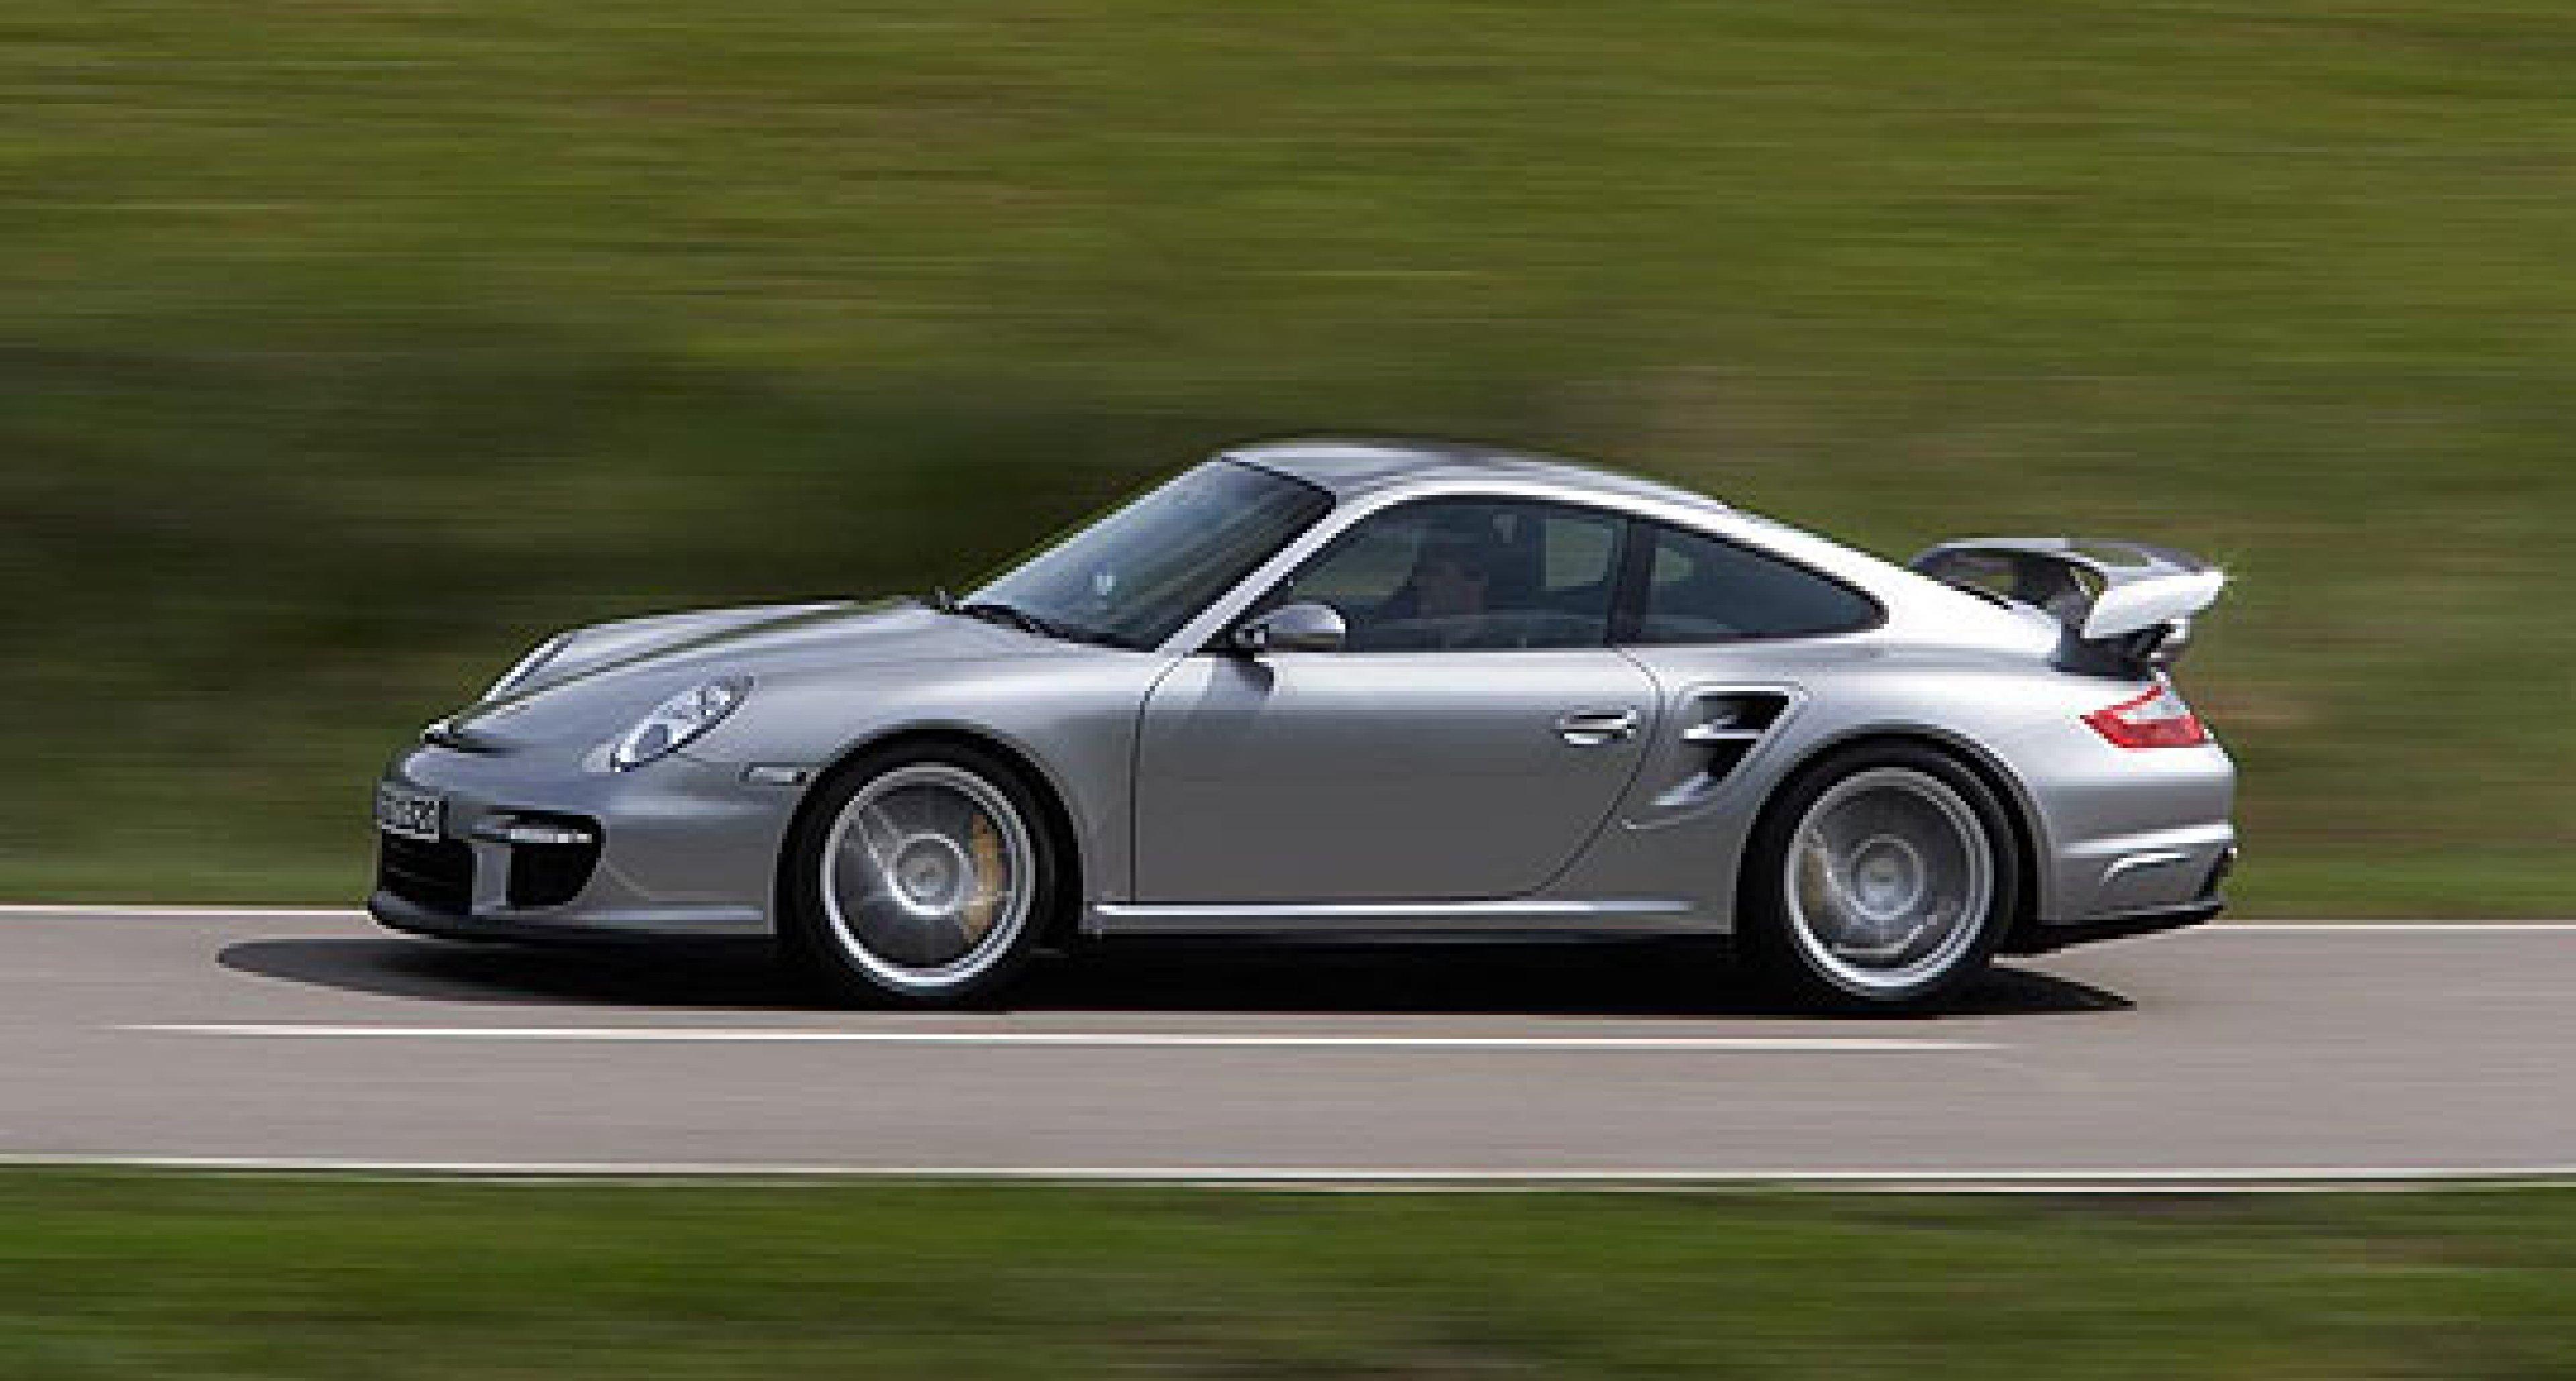 New 523bhp Porsche 911 GT2